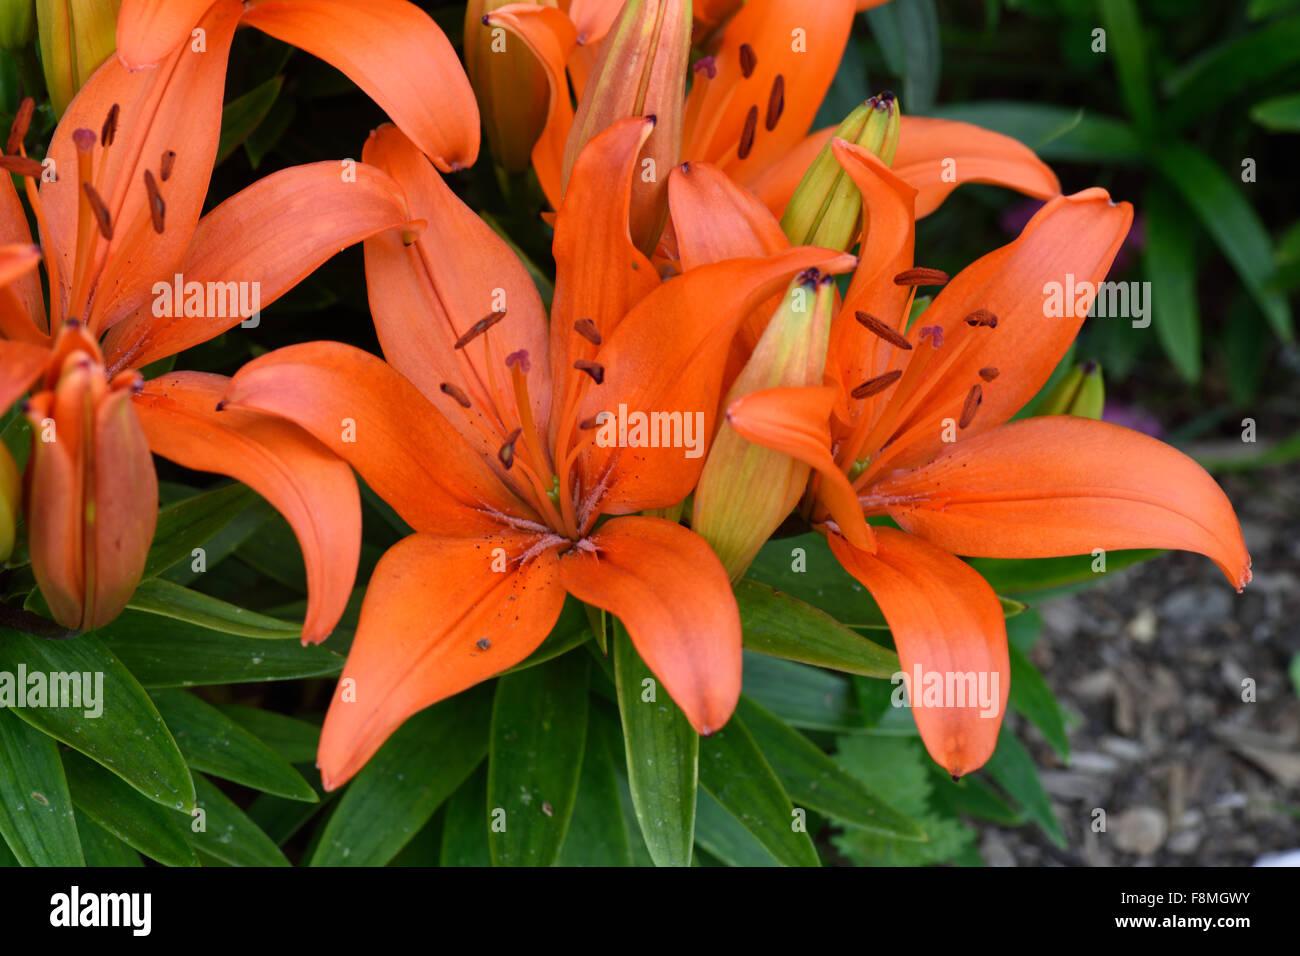 Low growing orange flowered lilies open in bright sunlight in a garden flower bed, Berkshire, June - Stock Image